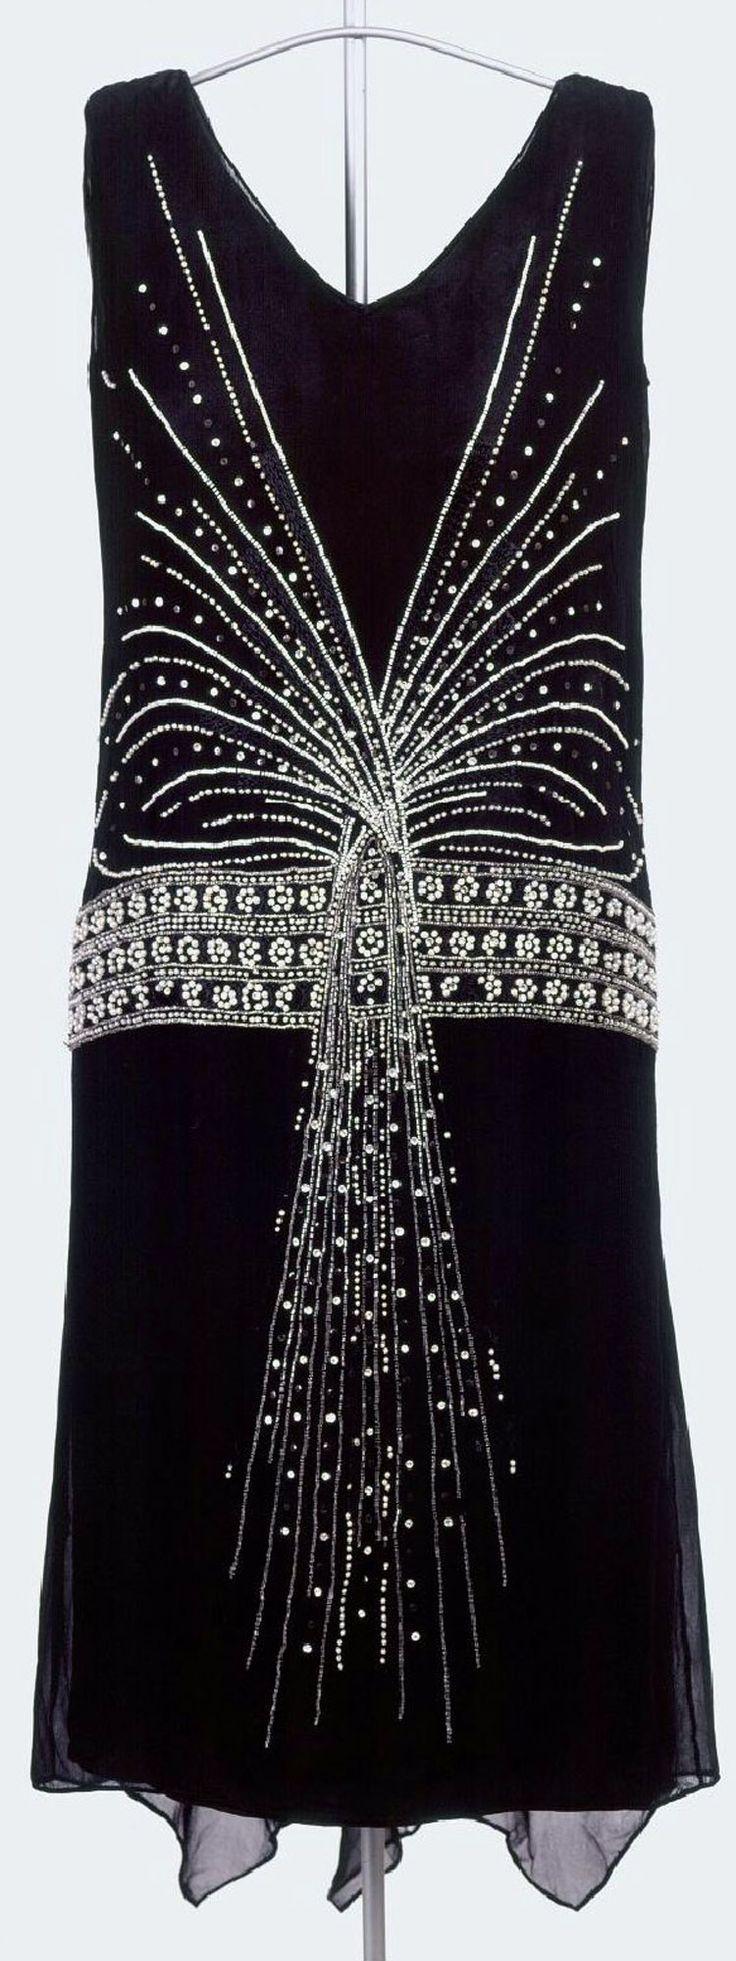 Panniers fashion terminal inc dresses